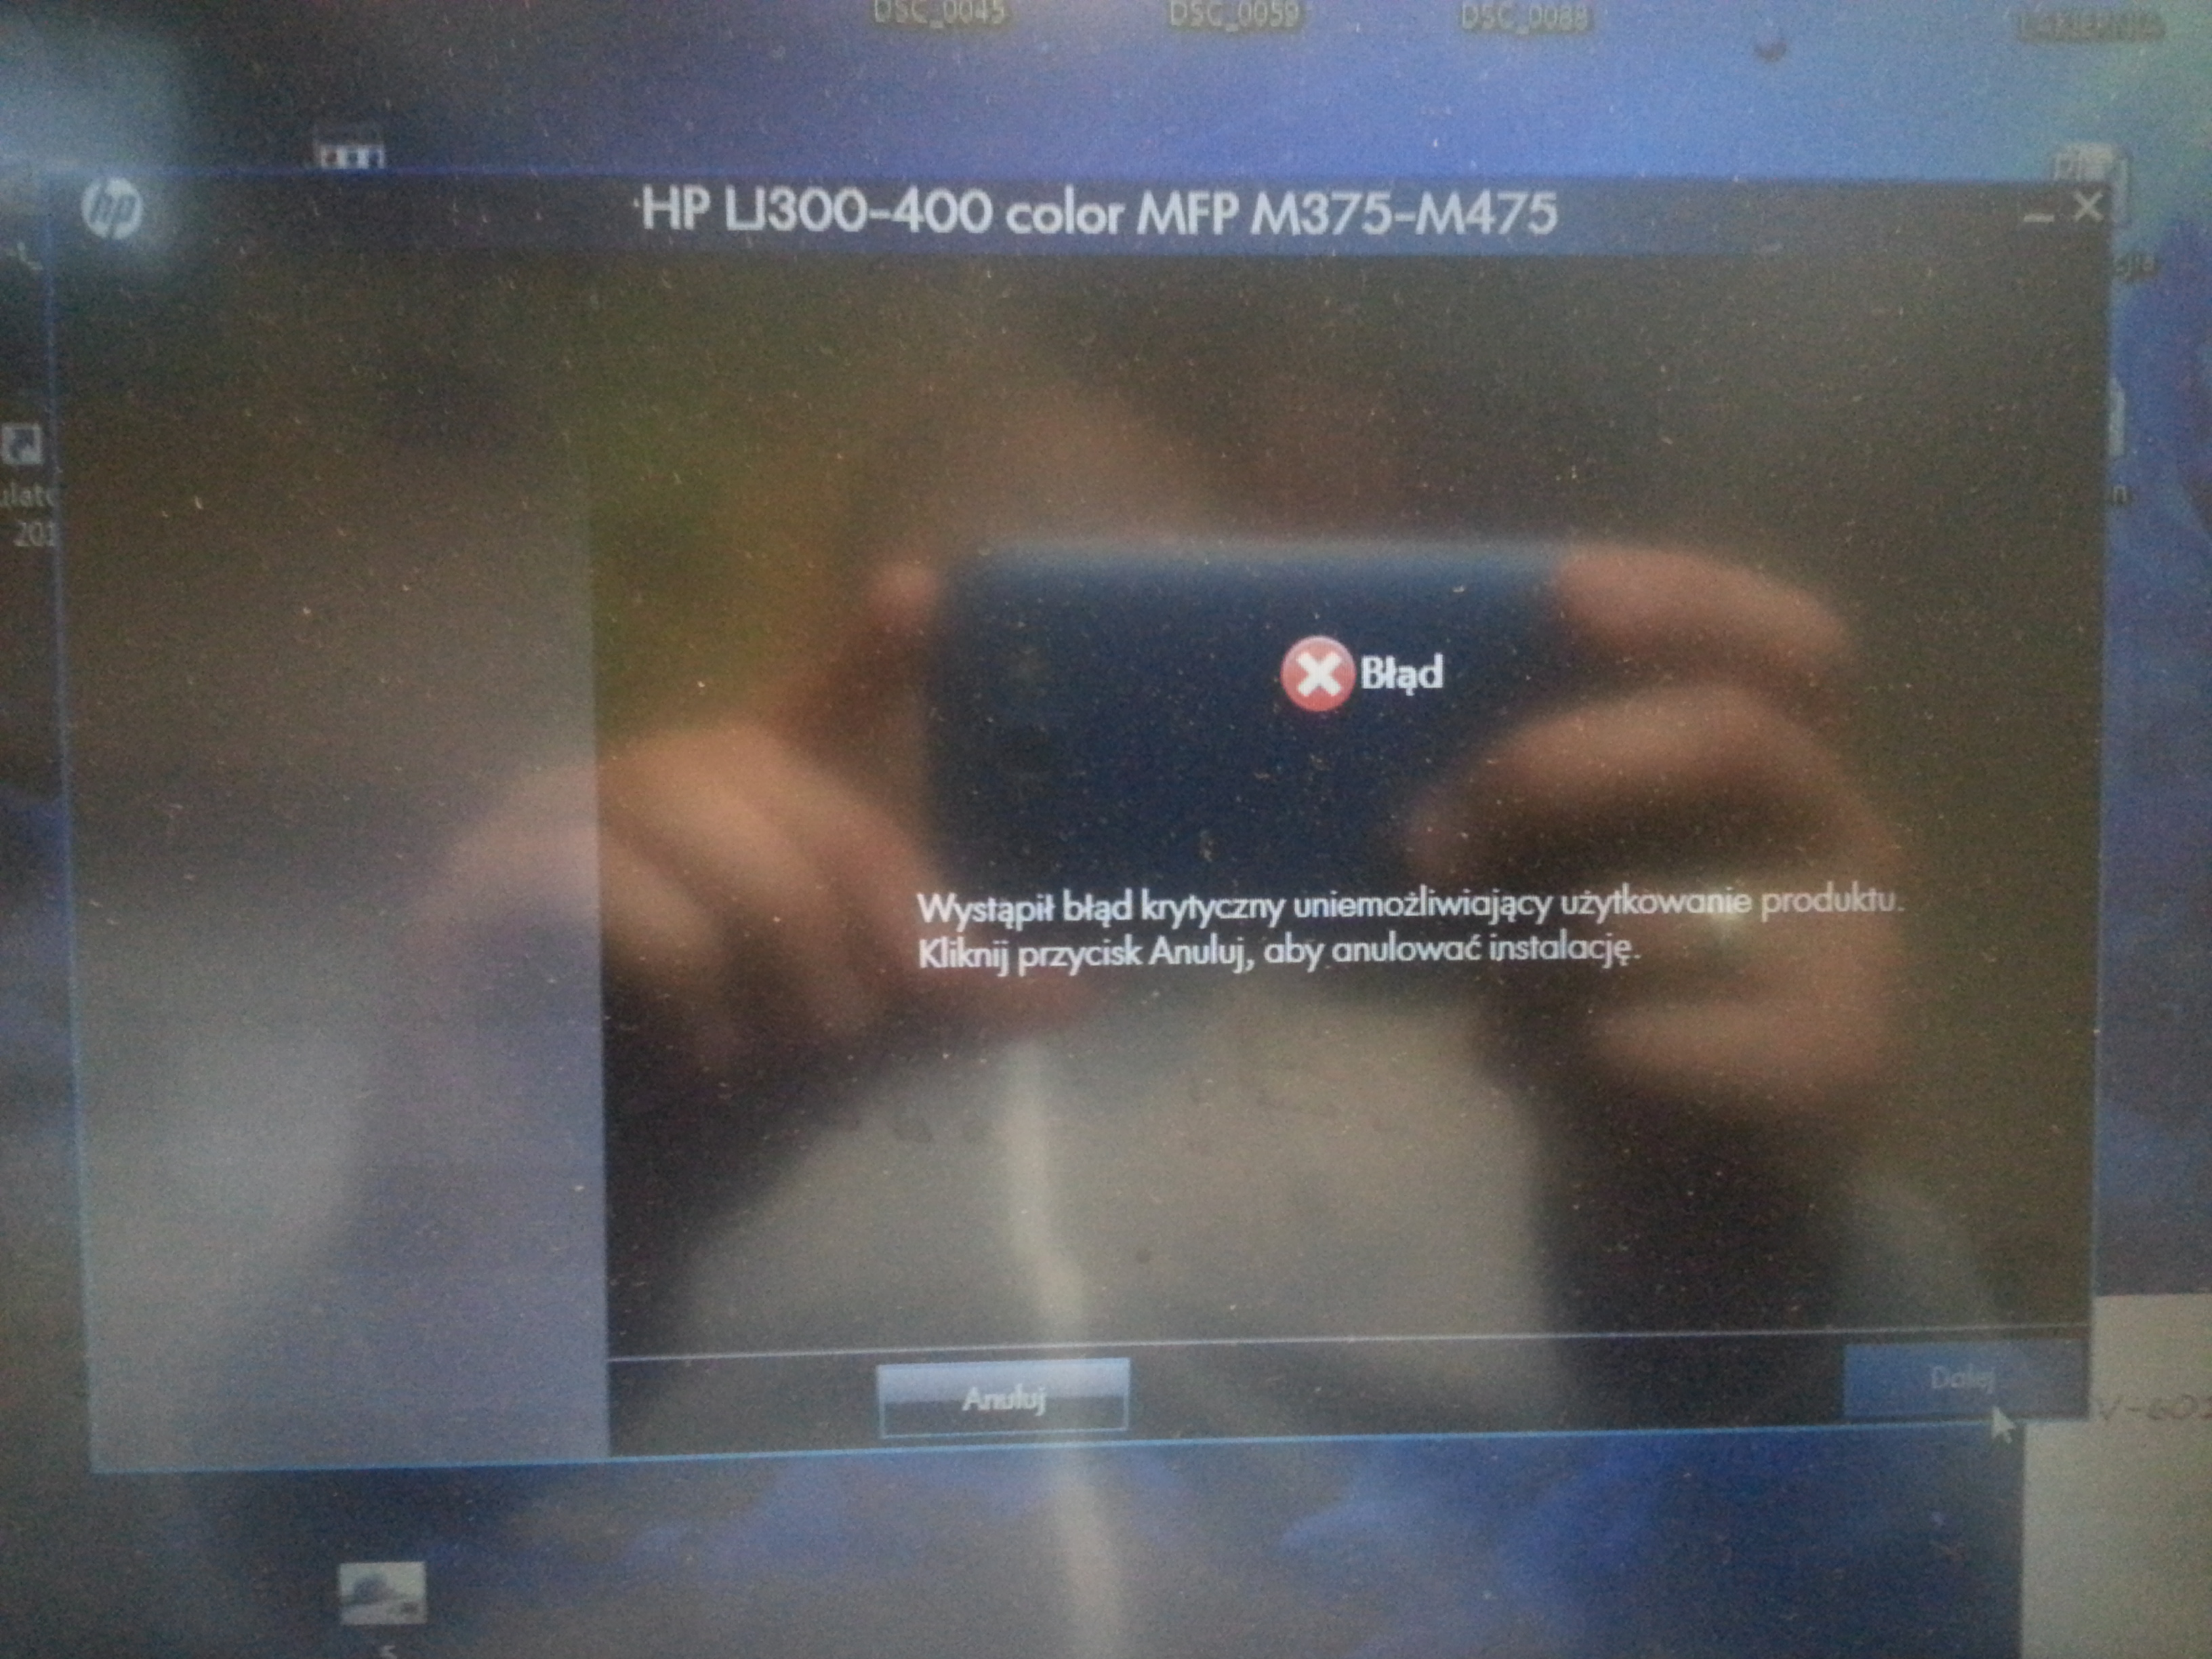 LaserJet 400 color mfp m475dn - Nie mog� zainstalowa� sterownika Windows 7 Prof